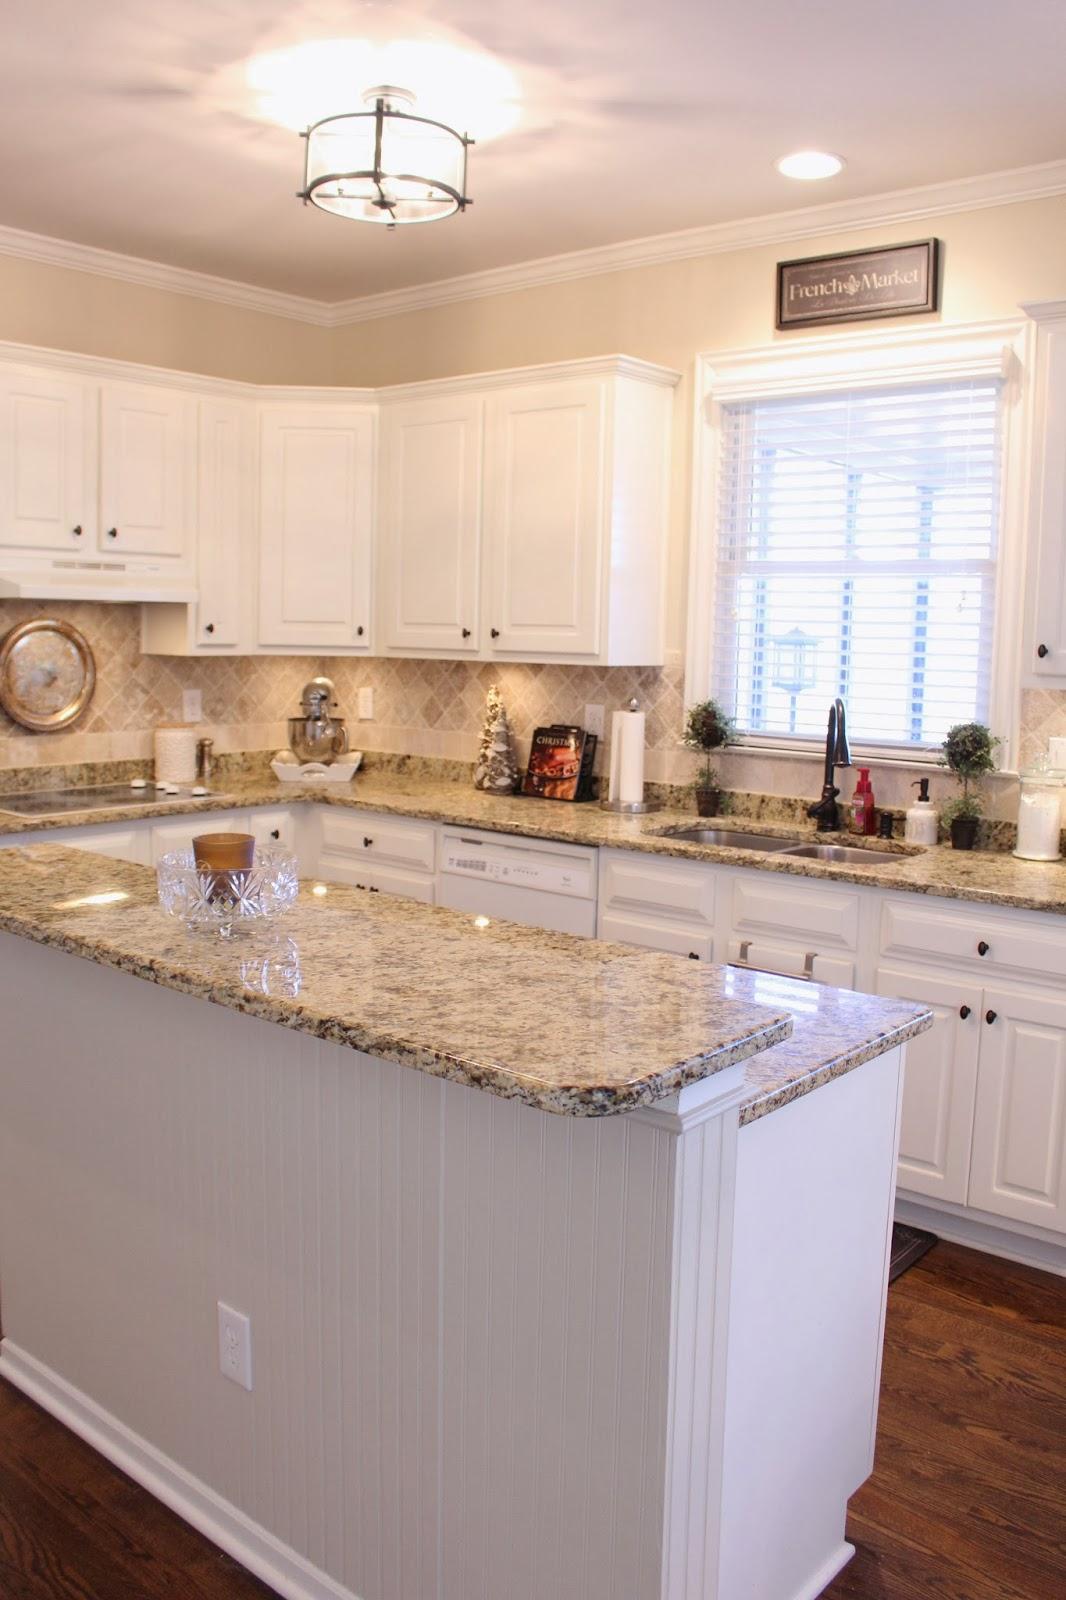 TiffanyD: Some progress in the kitchen...